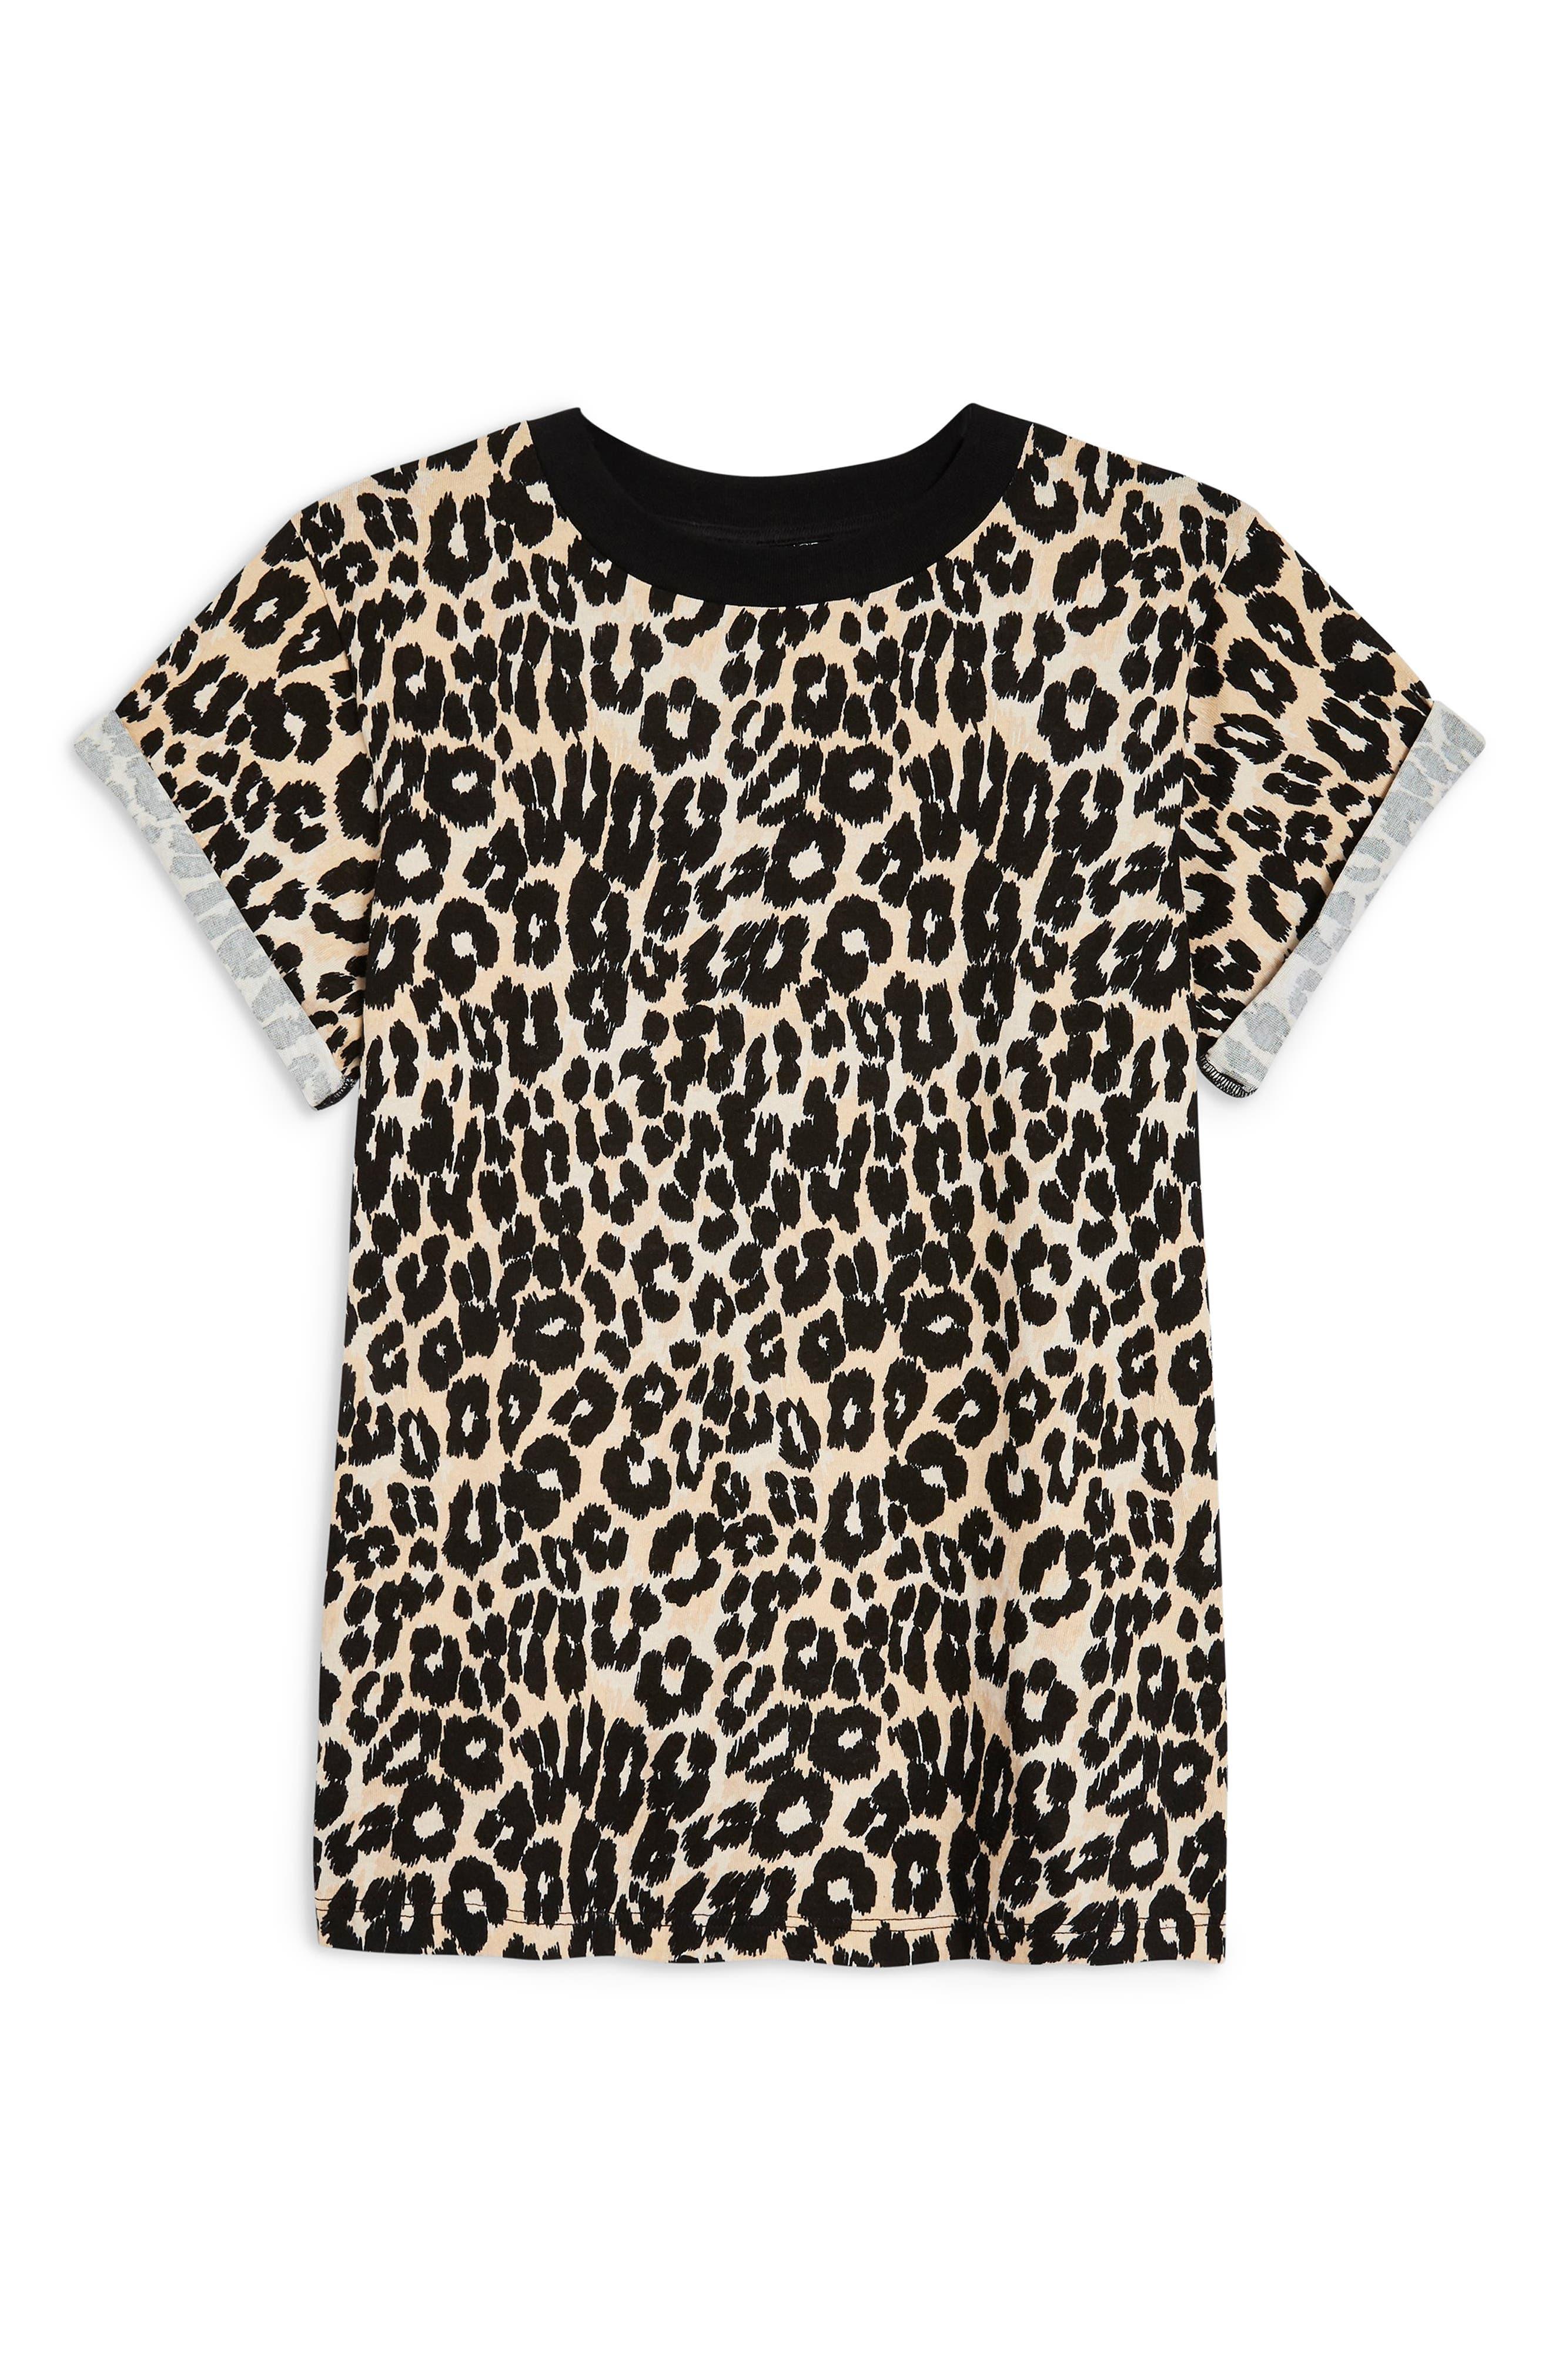 Leopard Print Tee,                             Alternate thumbnail 4, color,                             Black Multi